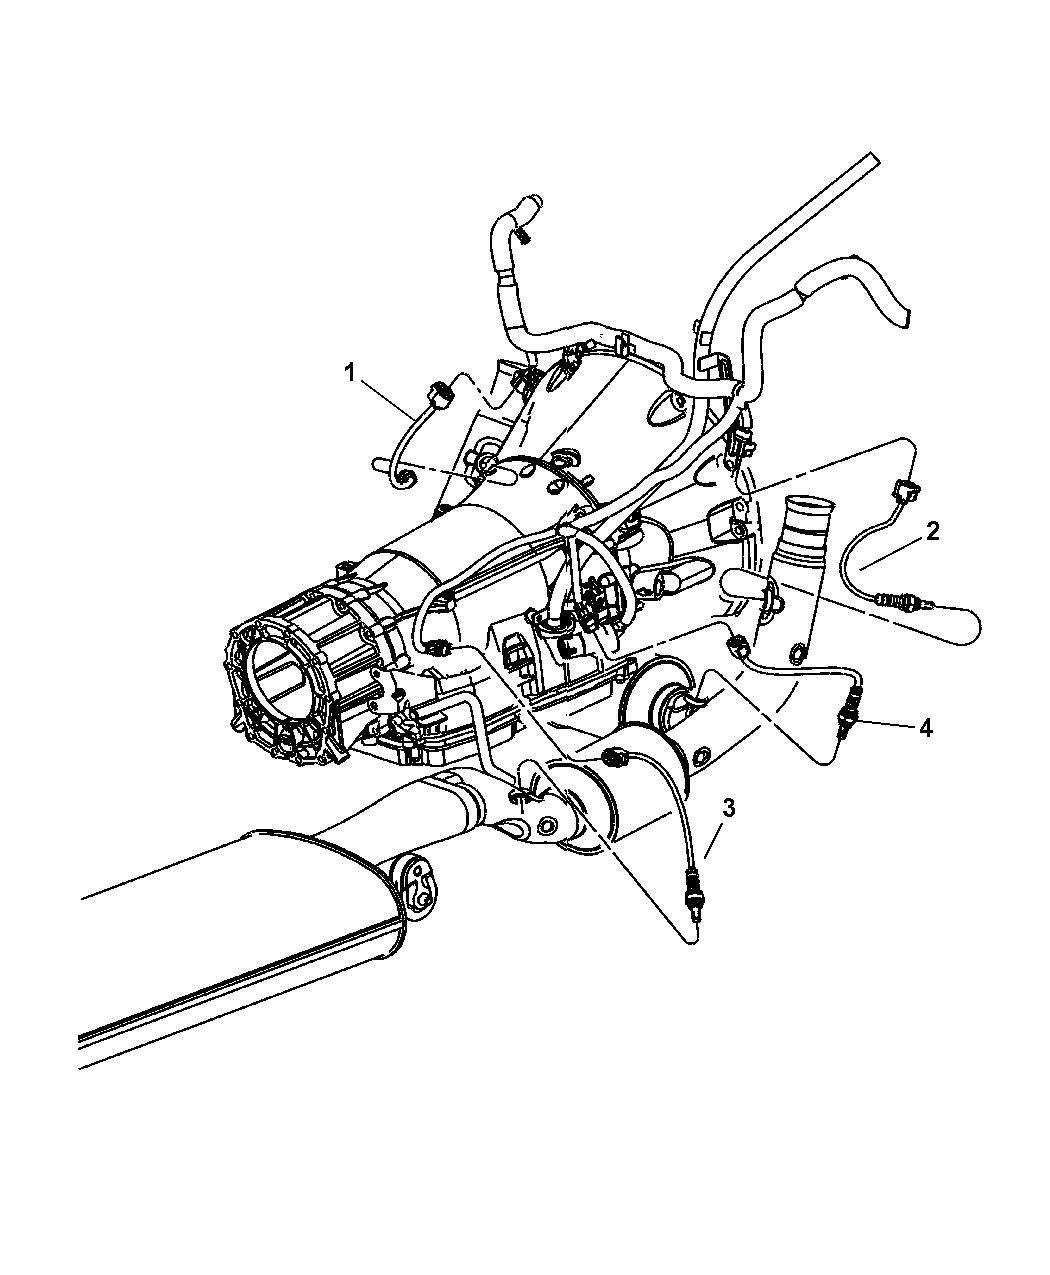 2011 jeep grand cherokee oxygen sensors - mopar parts giant jeep grand  cherokee wiring diagram sensor